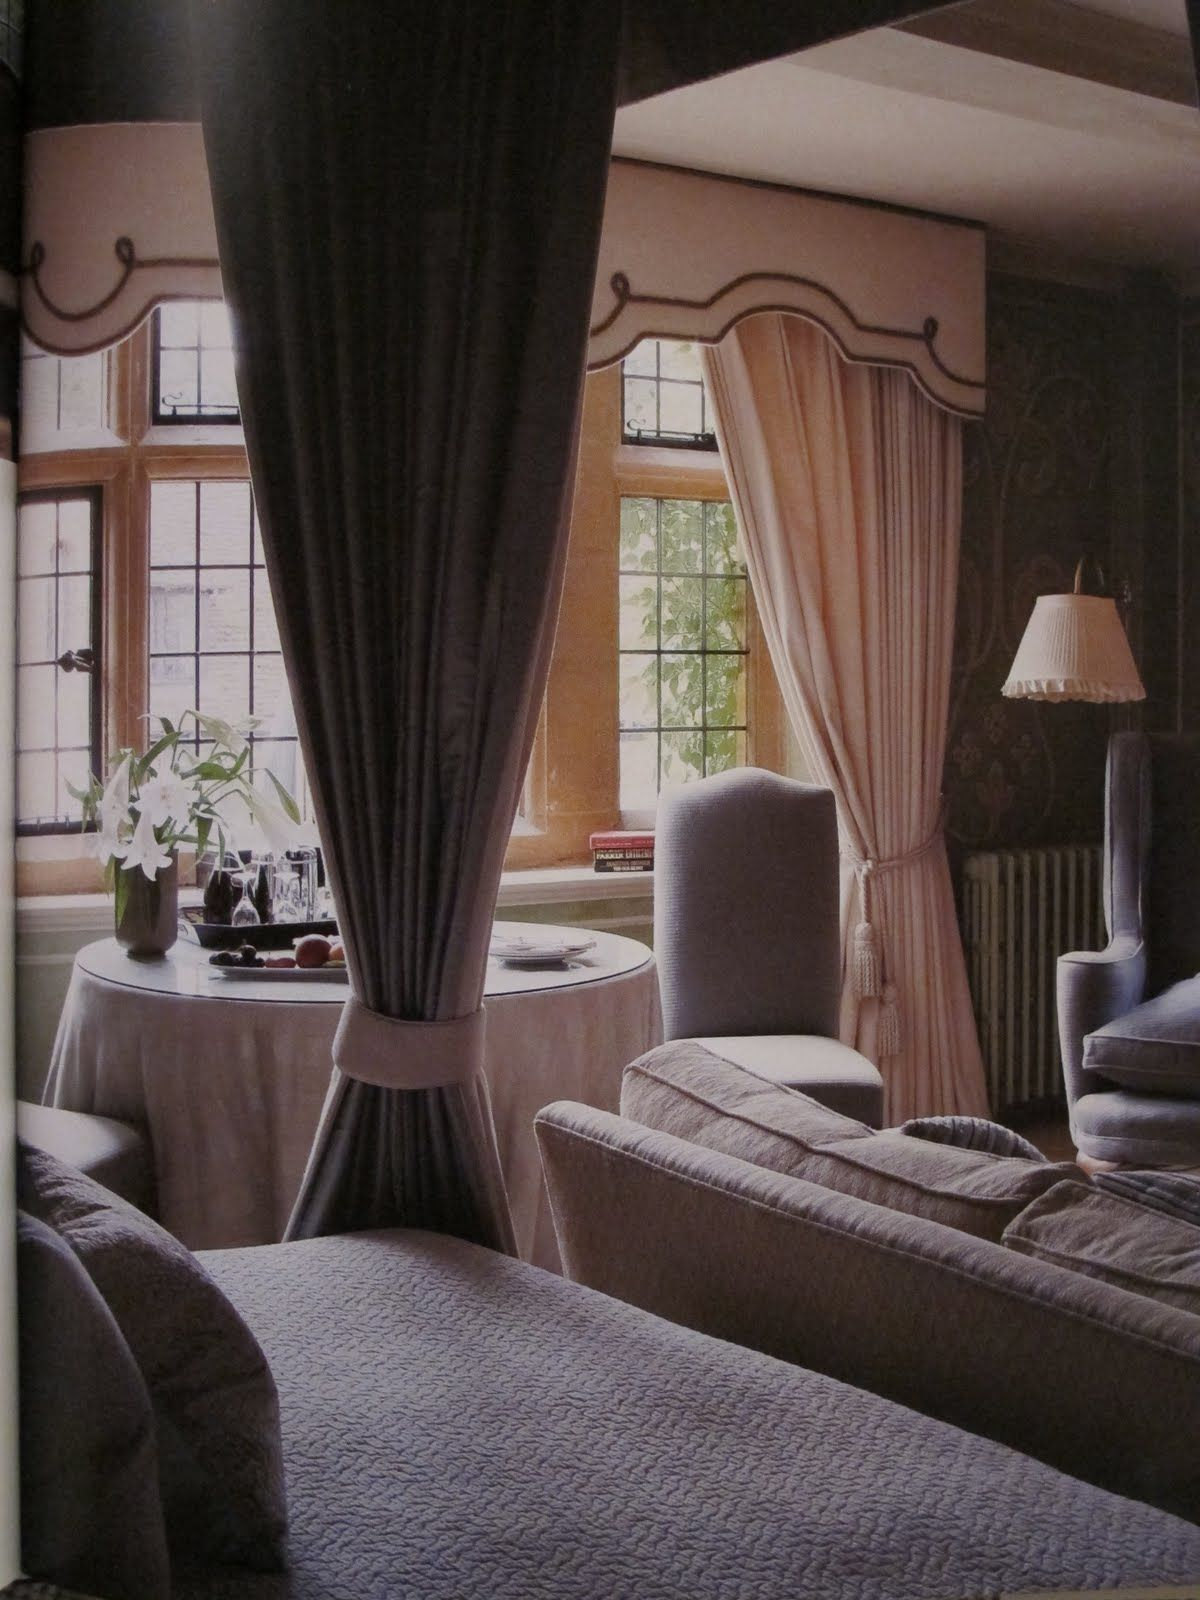 Hollyhock guest room at Le Manoir Aux' Quat Saisons, England. Great Britain.  So peaceful.